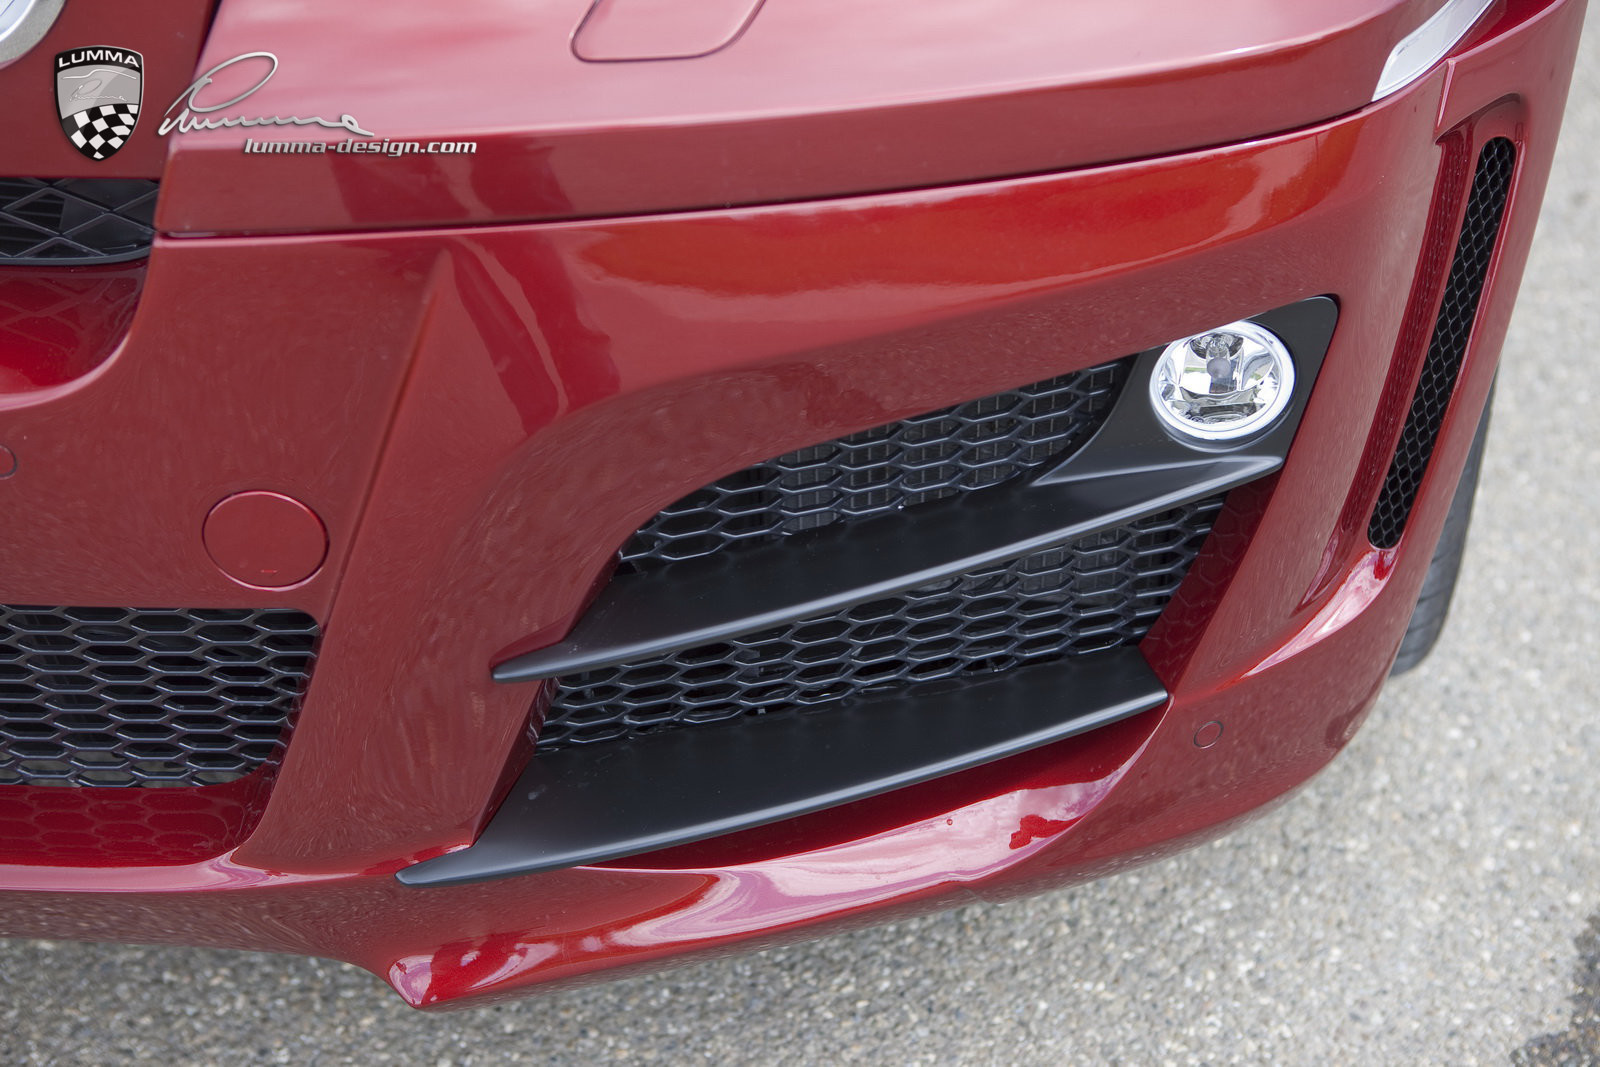 LUMMA CLR X 650 BODY KITS FOR BMW X6 50I E71 NEW MODEL 2020